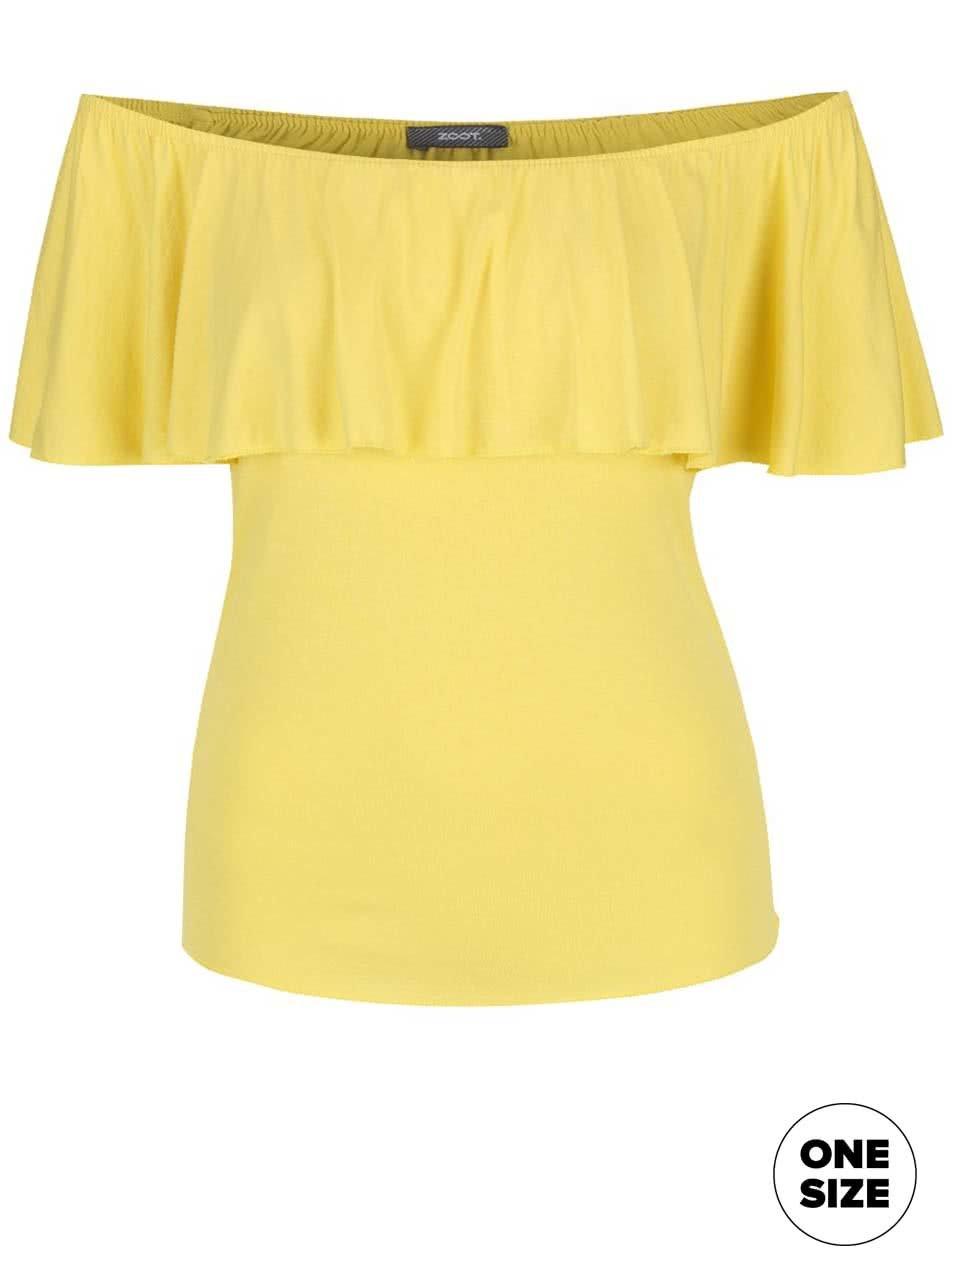 Žluté tričko s odhalenými rameny ZOOT simple